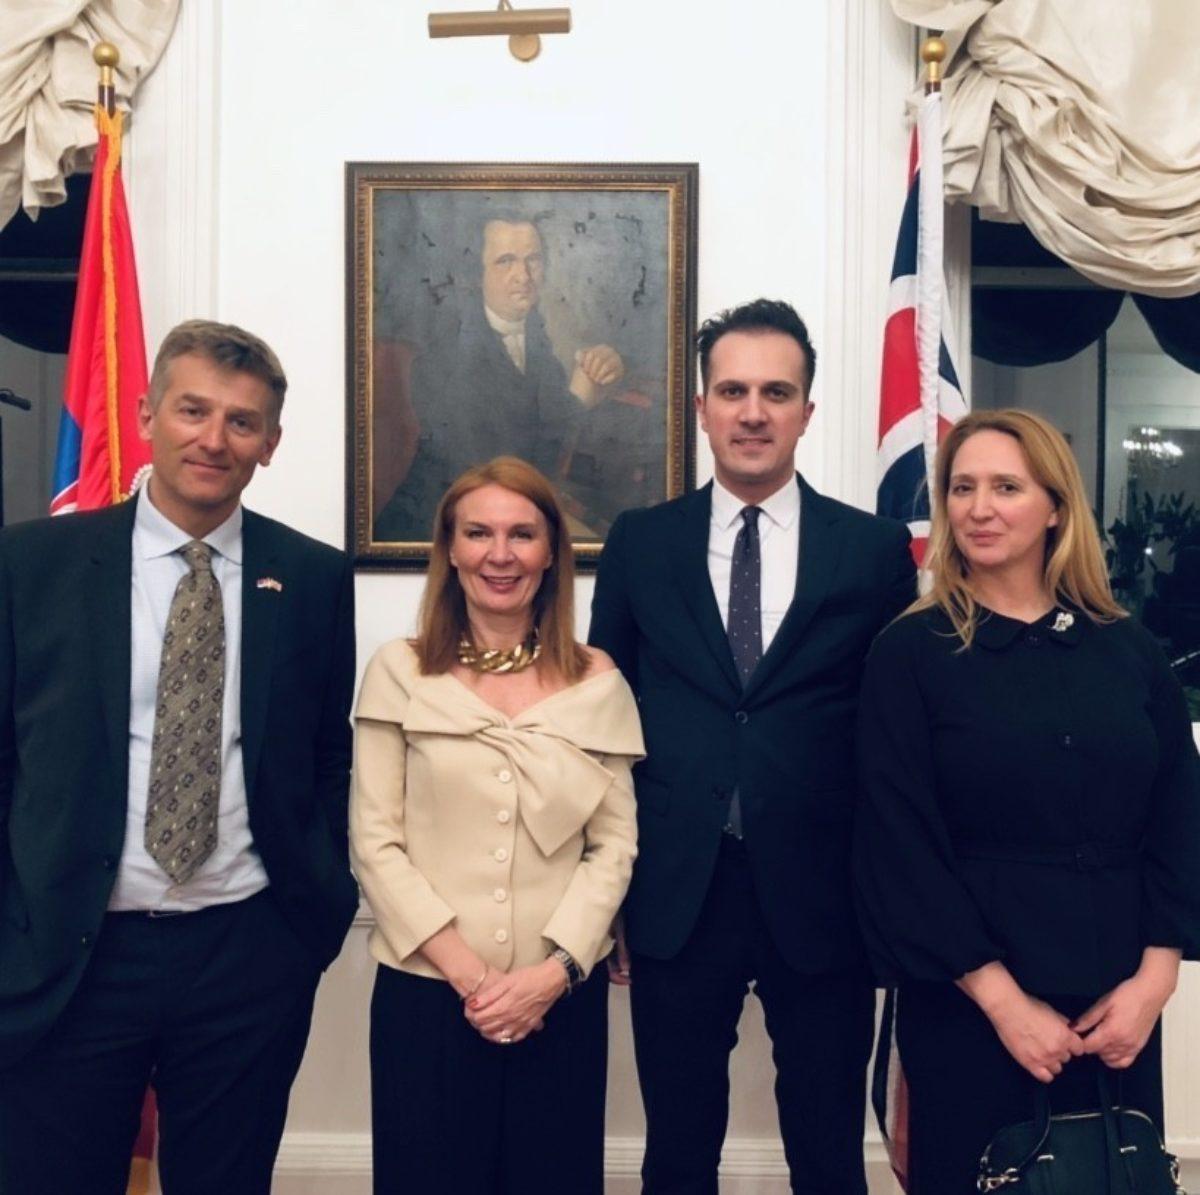 Zaključena velika i uspešna saradnja u Londonu